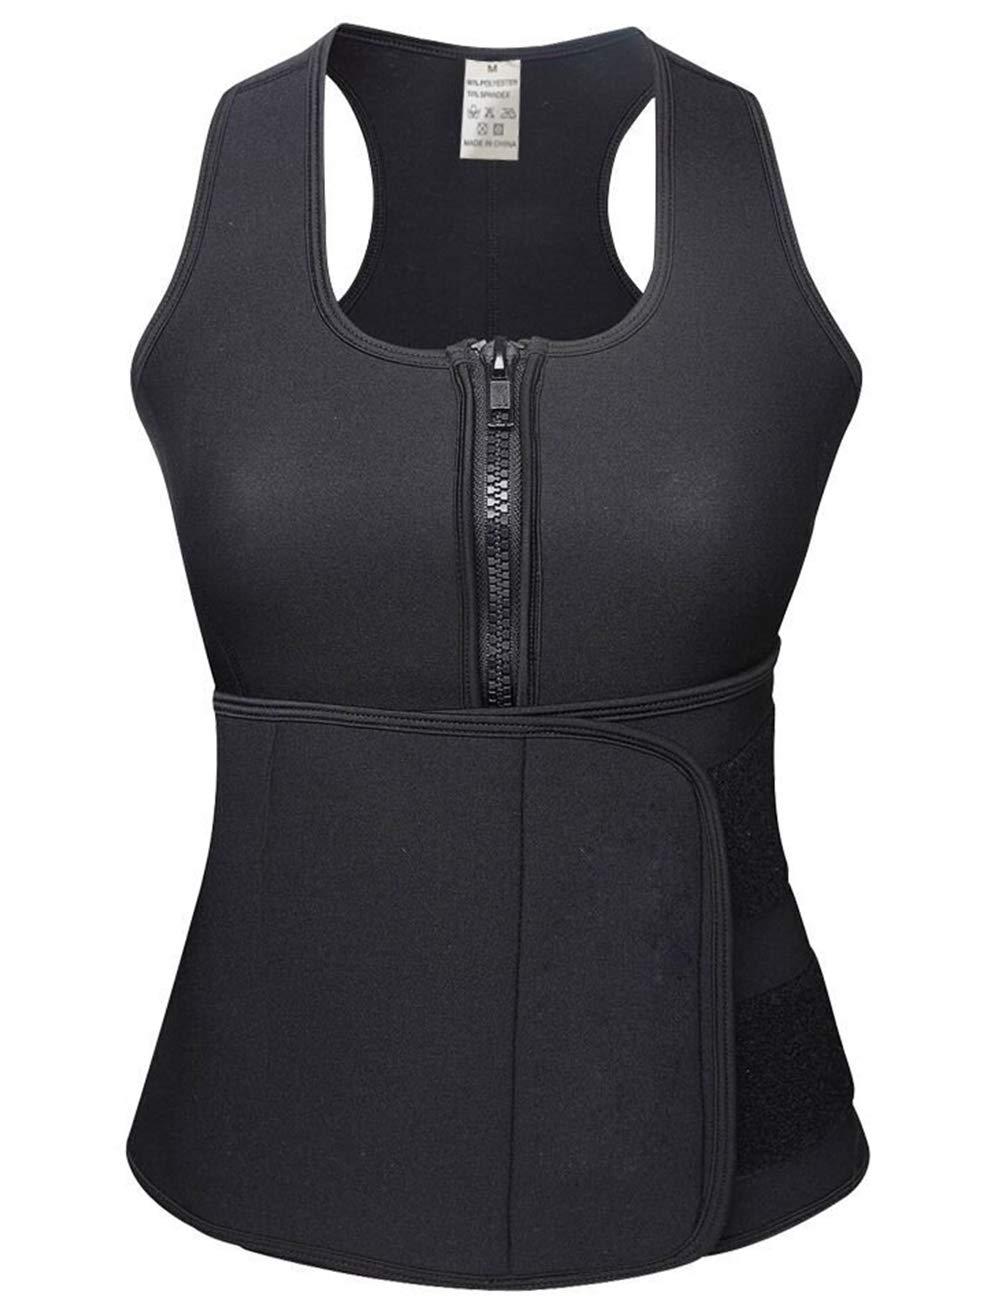 HEXIN Women Waist Trainer Neoprene Hot Sweat Sauna Vest with Waist Trimmer Belt for Weight Loss Black S